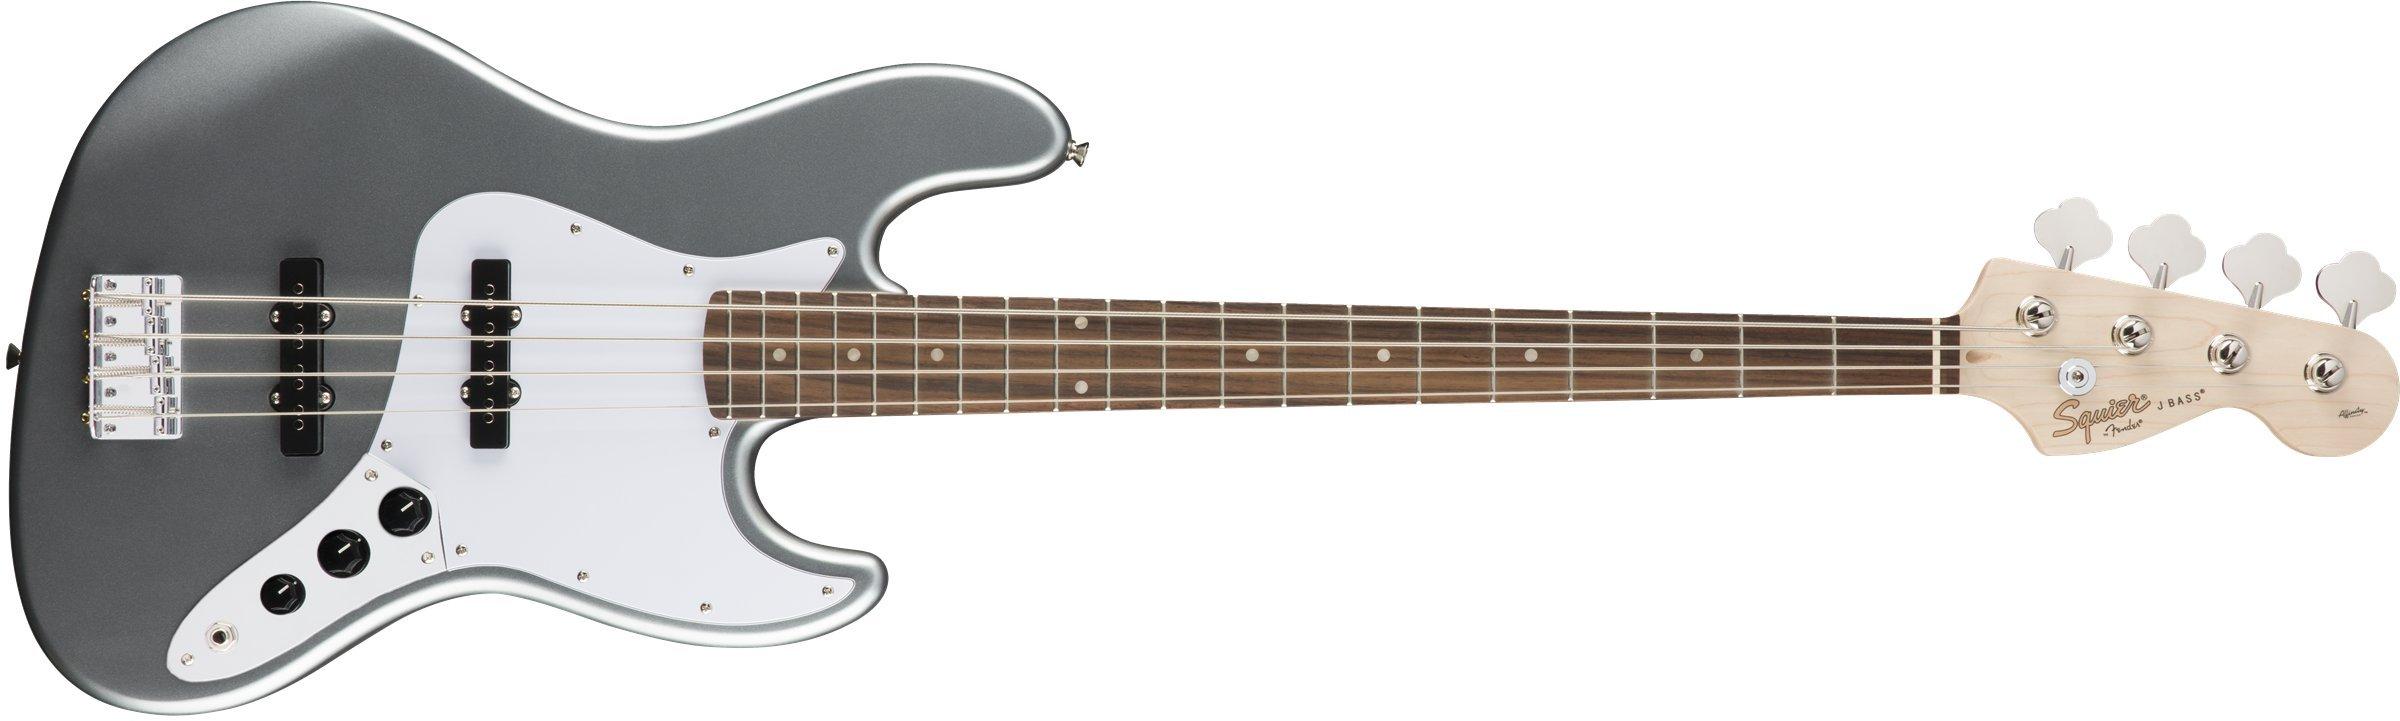 Squier by Fender Affinity Series Jazz Bass - Laurel Fingerboard - Slick Silver